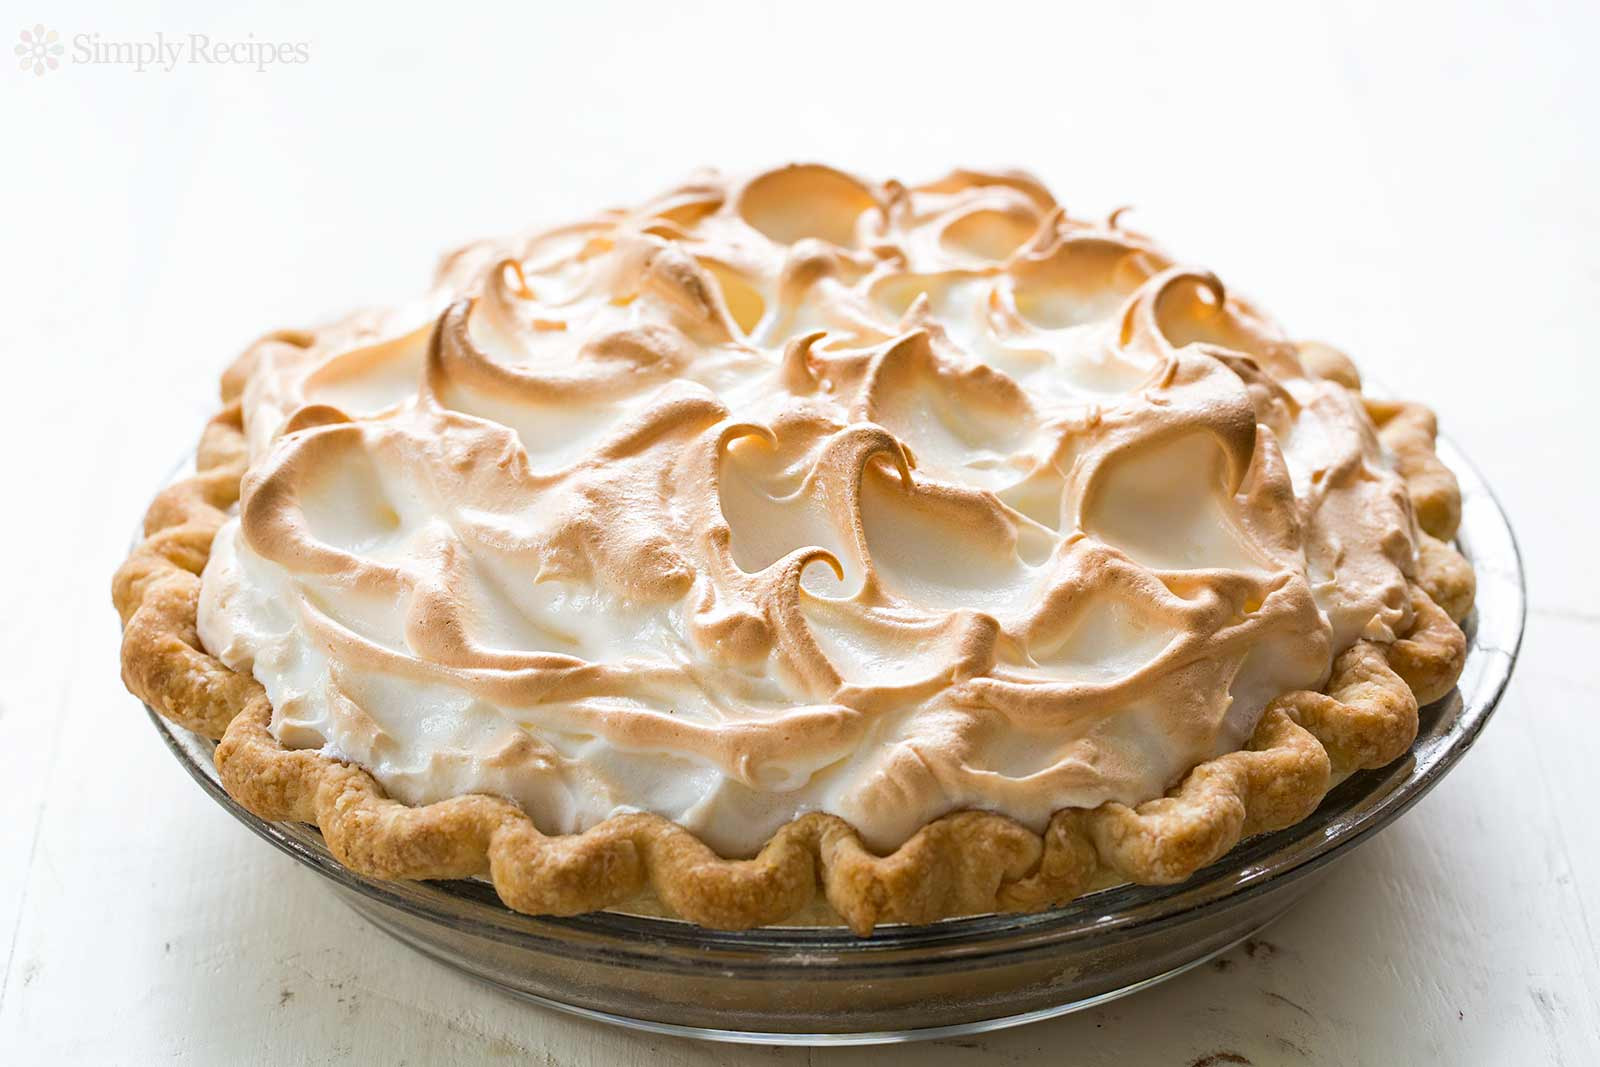 Recipe For Lemon Meringue Pie  The BEST Lemon Meringue Pie Perfect Meringue Tip